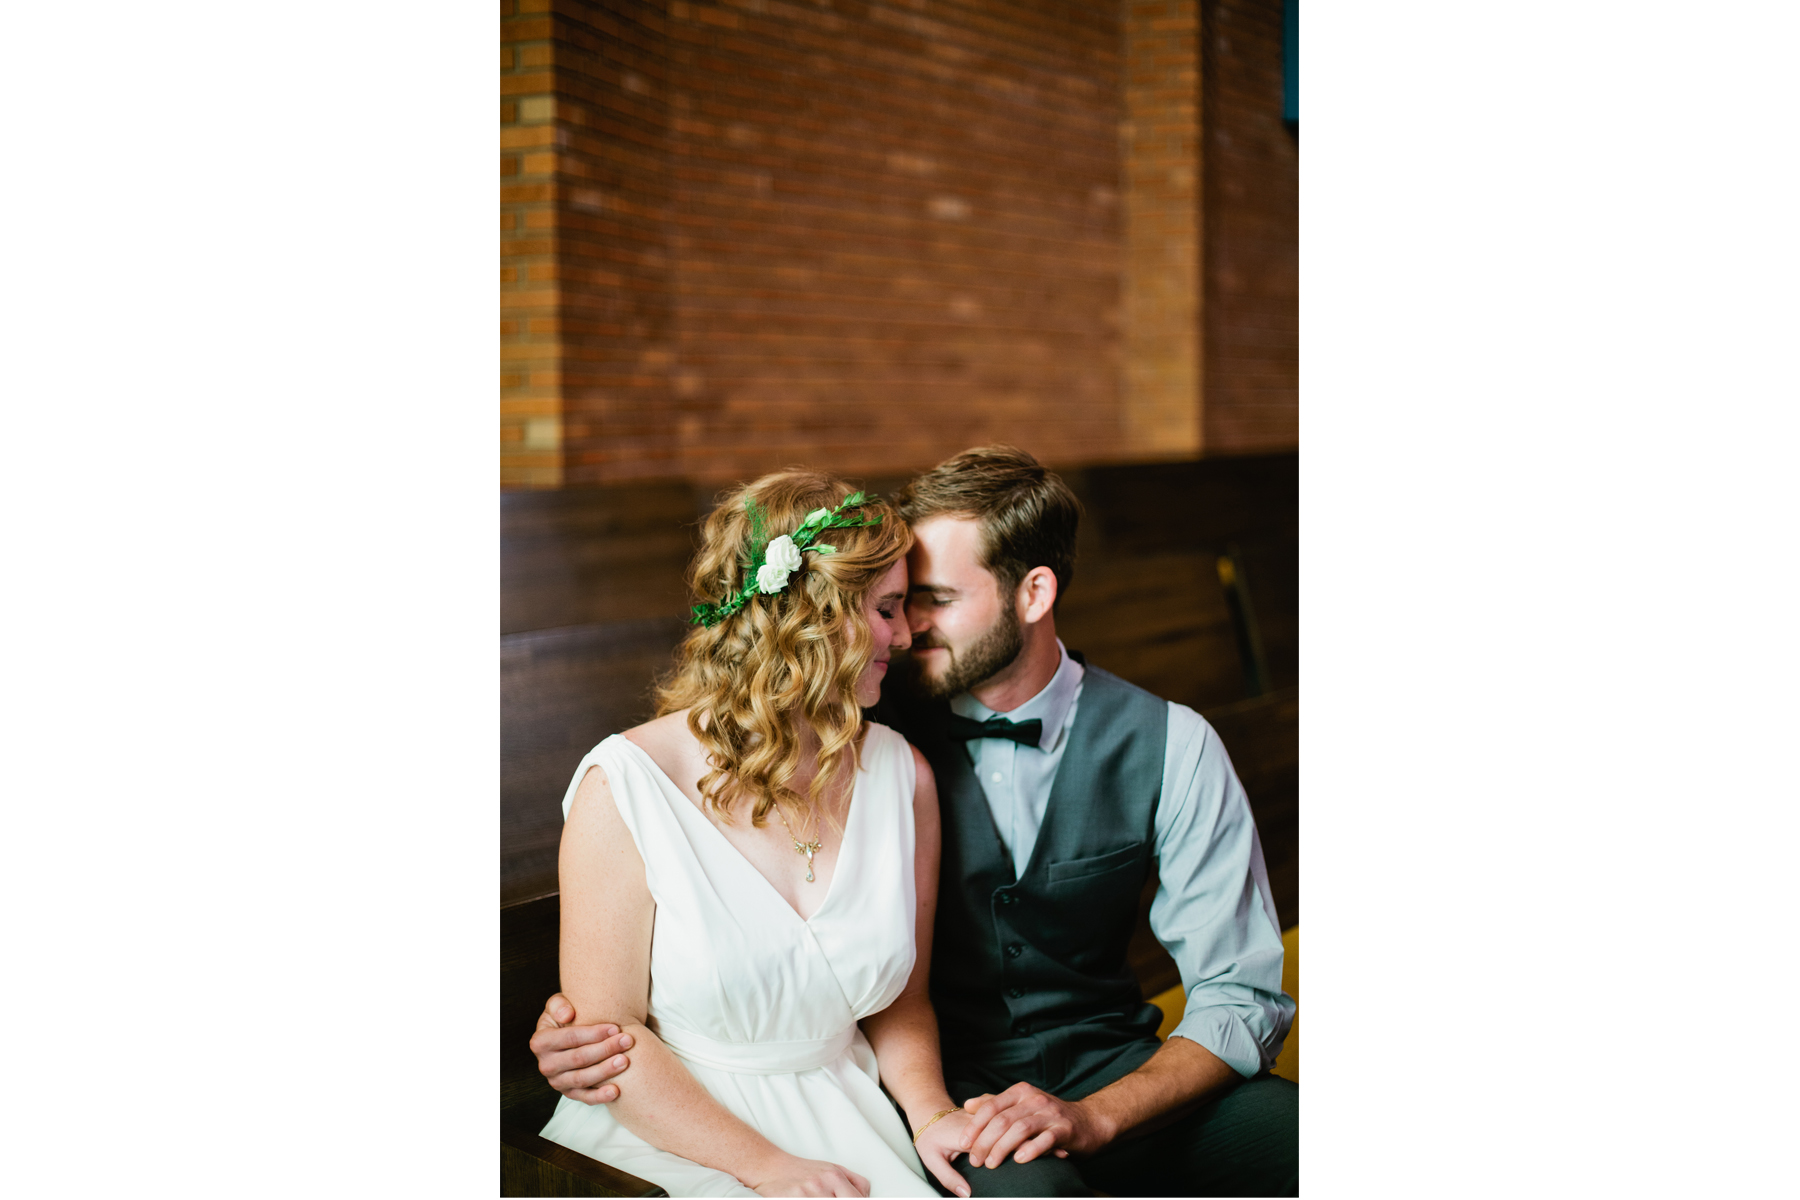 ames_wedding_photos03.jpg